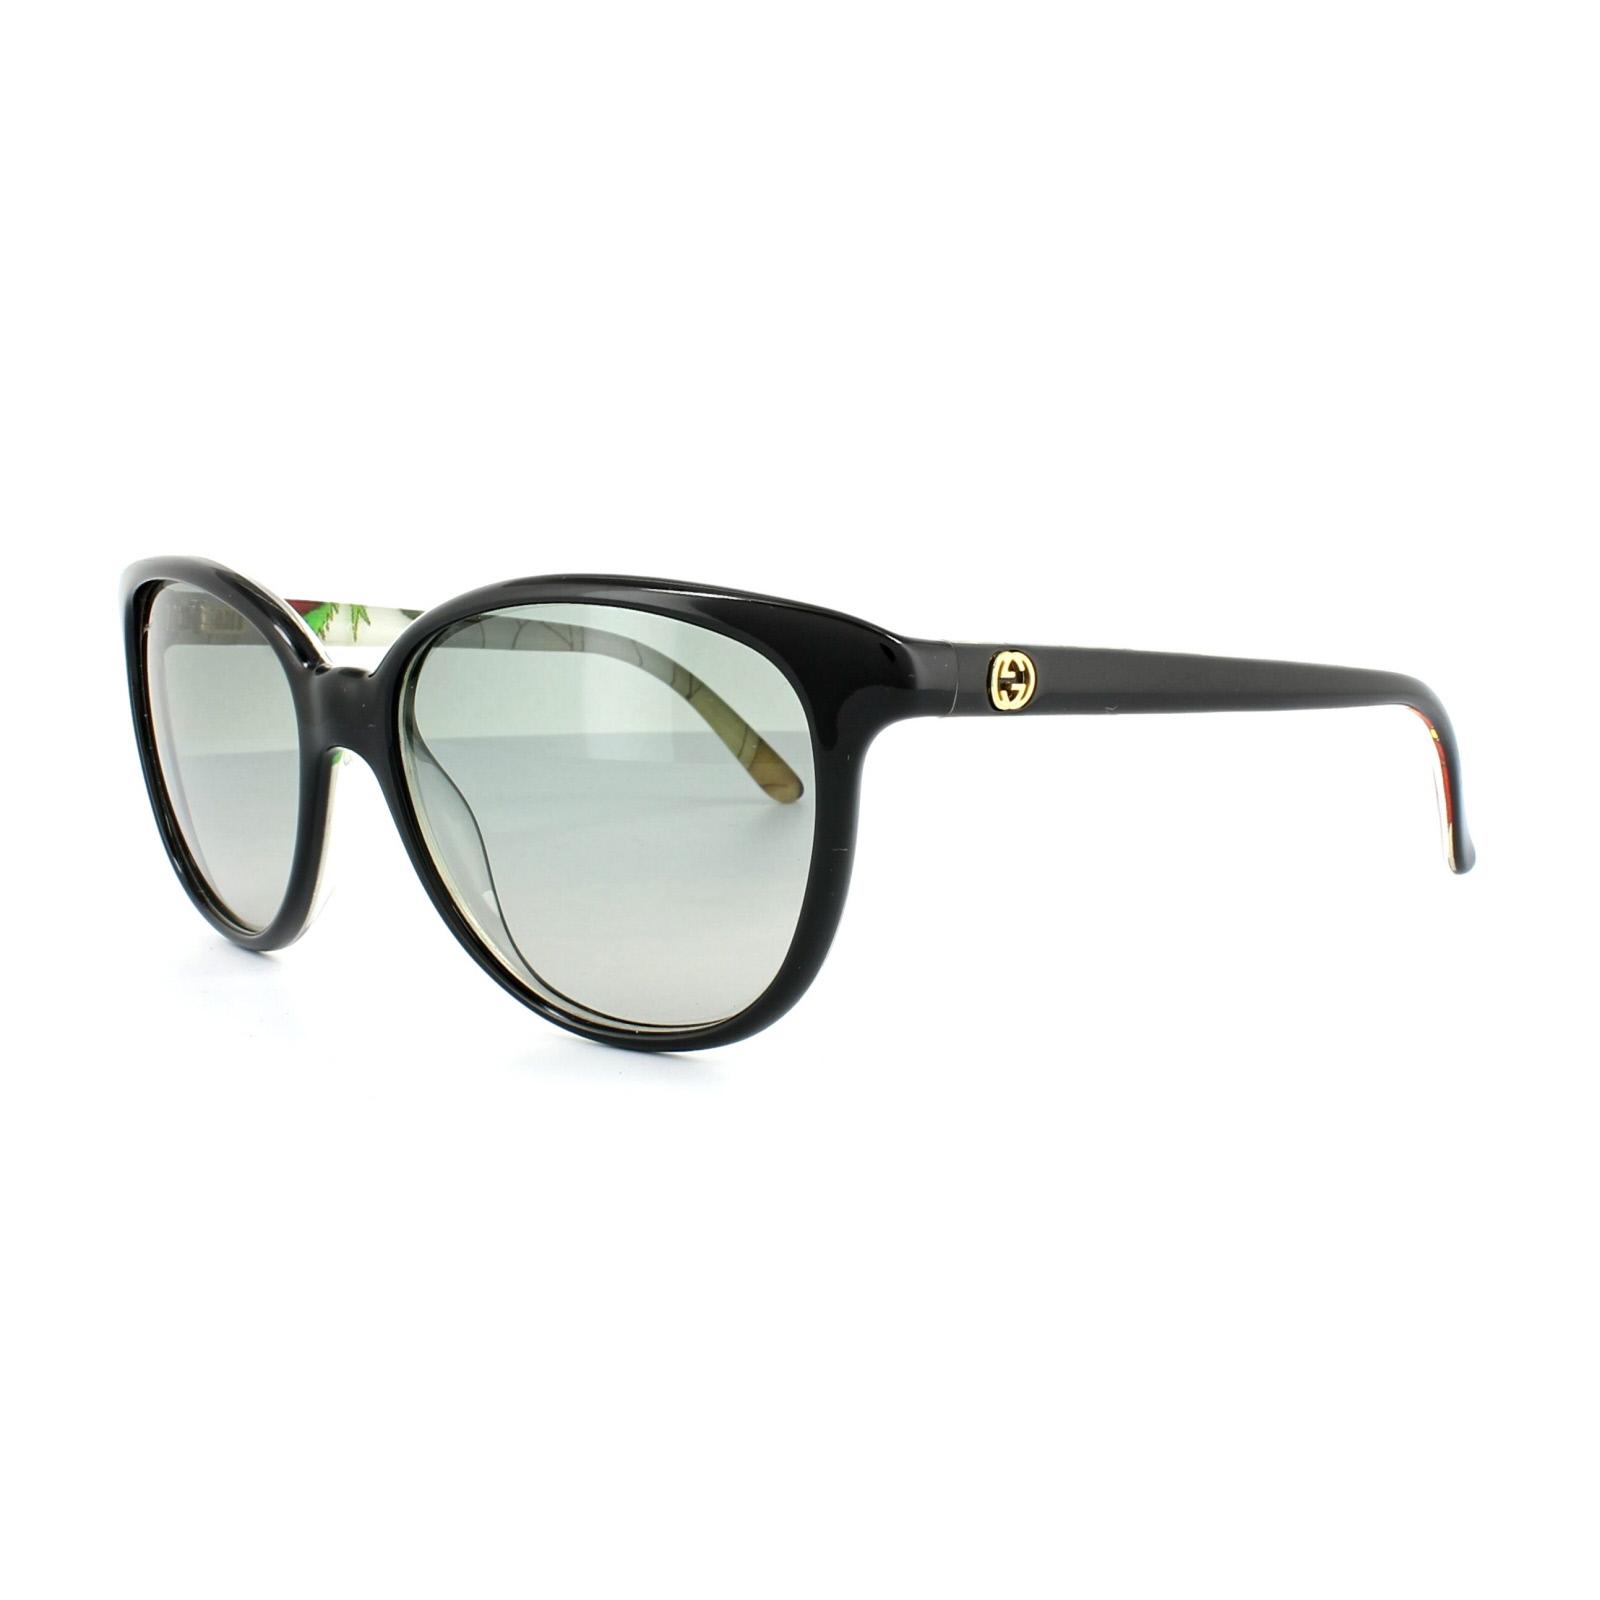 db84b0c734 Sentinel Gucci Sunglasses 3633 N S Z96 VK Black Flower Grey Gradient